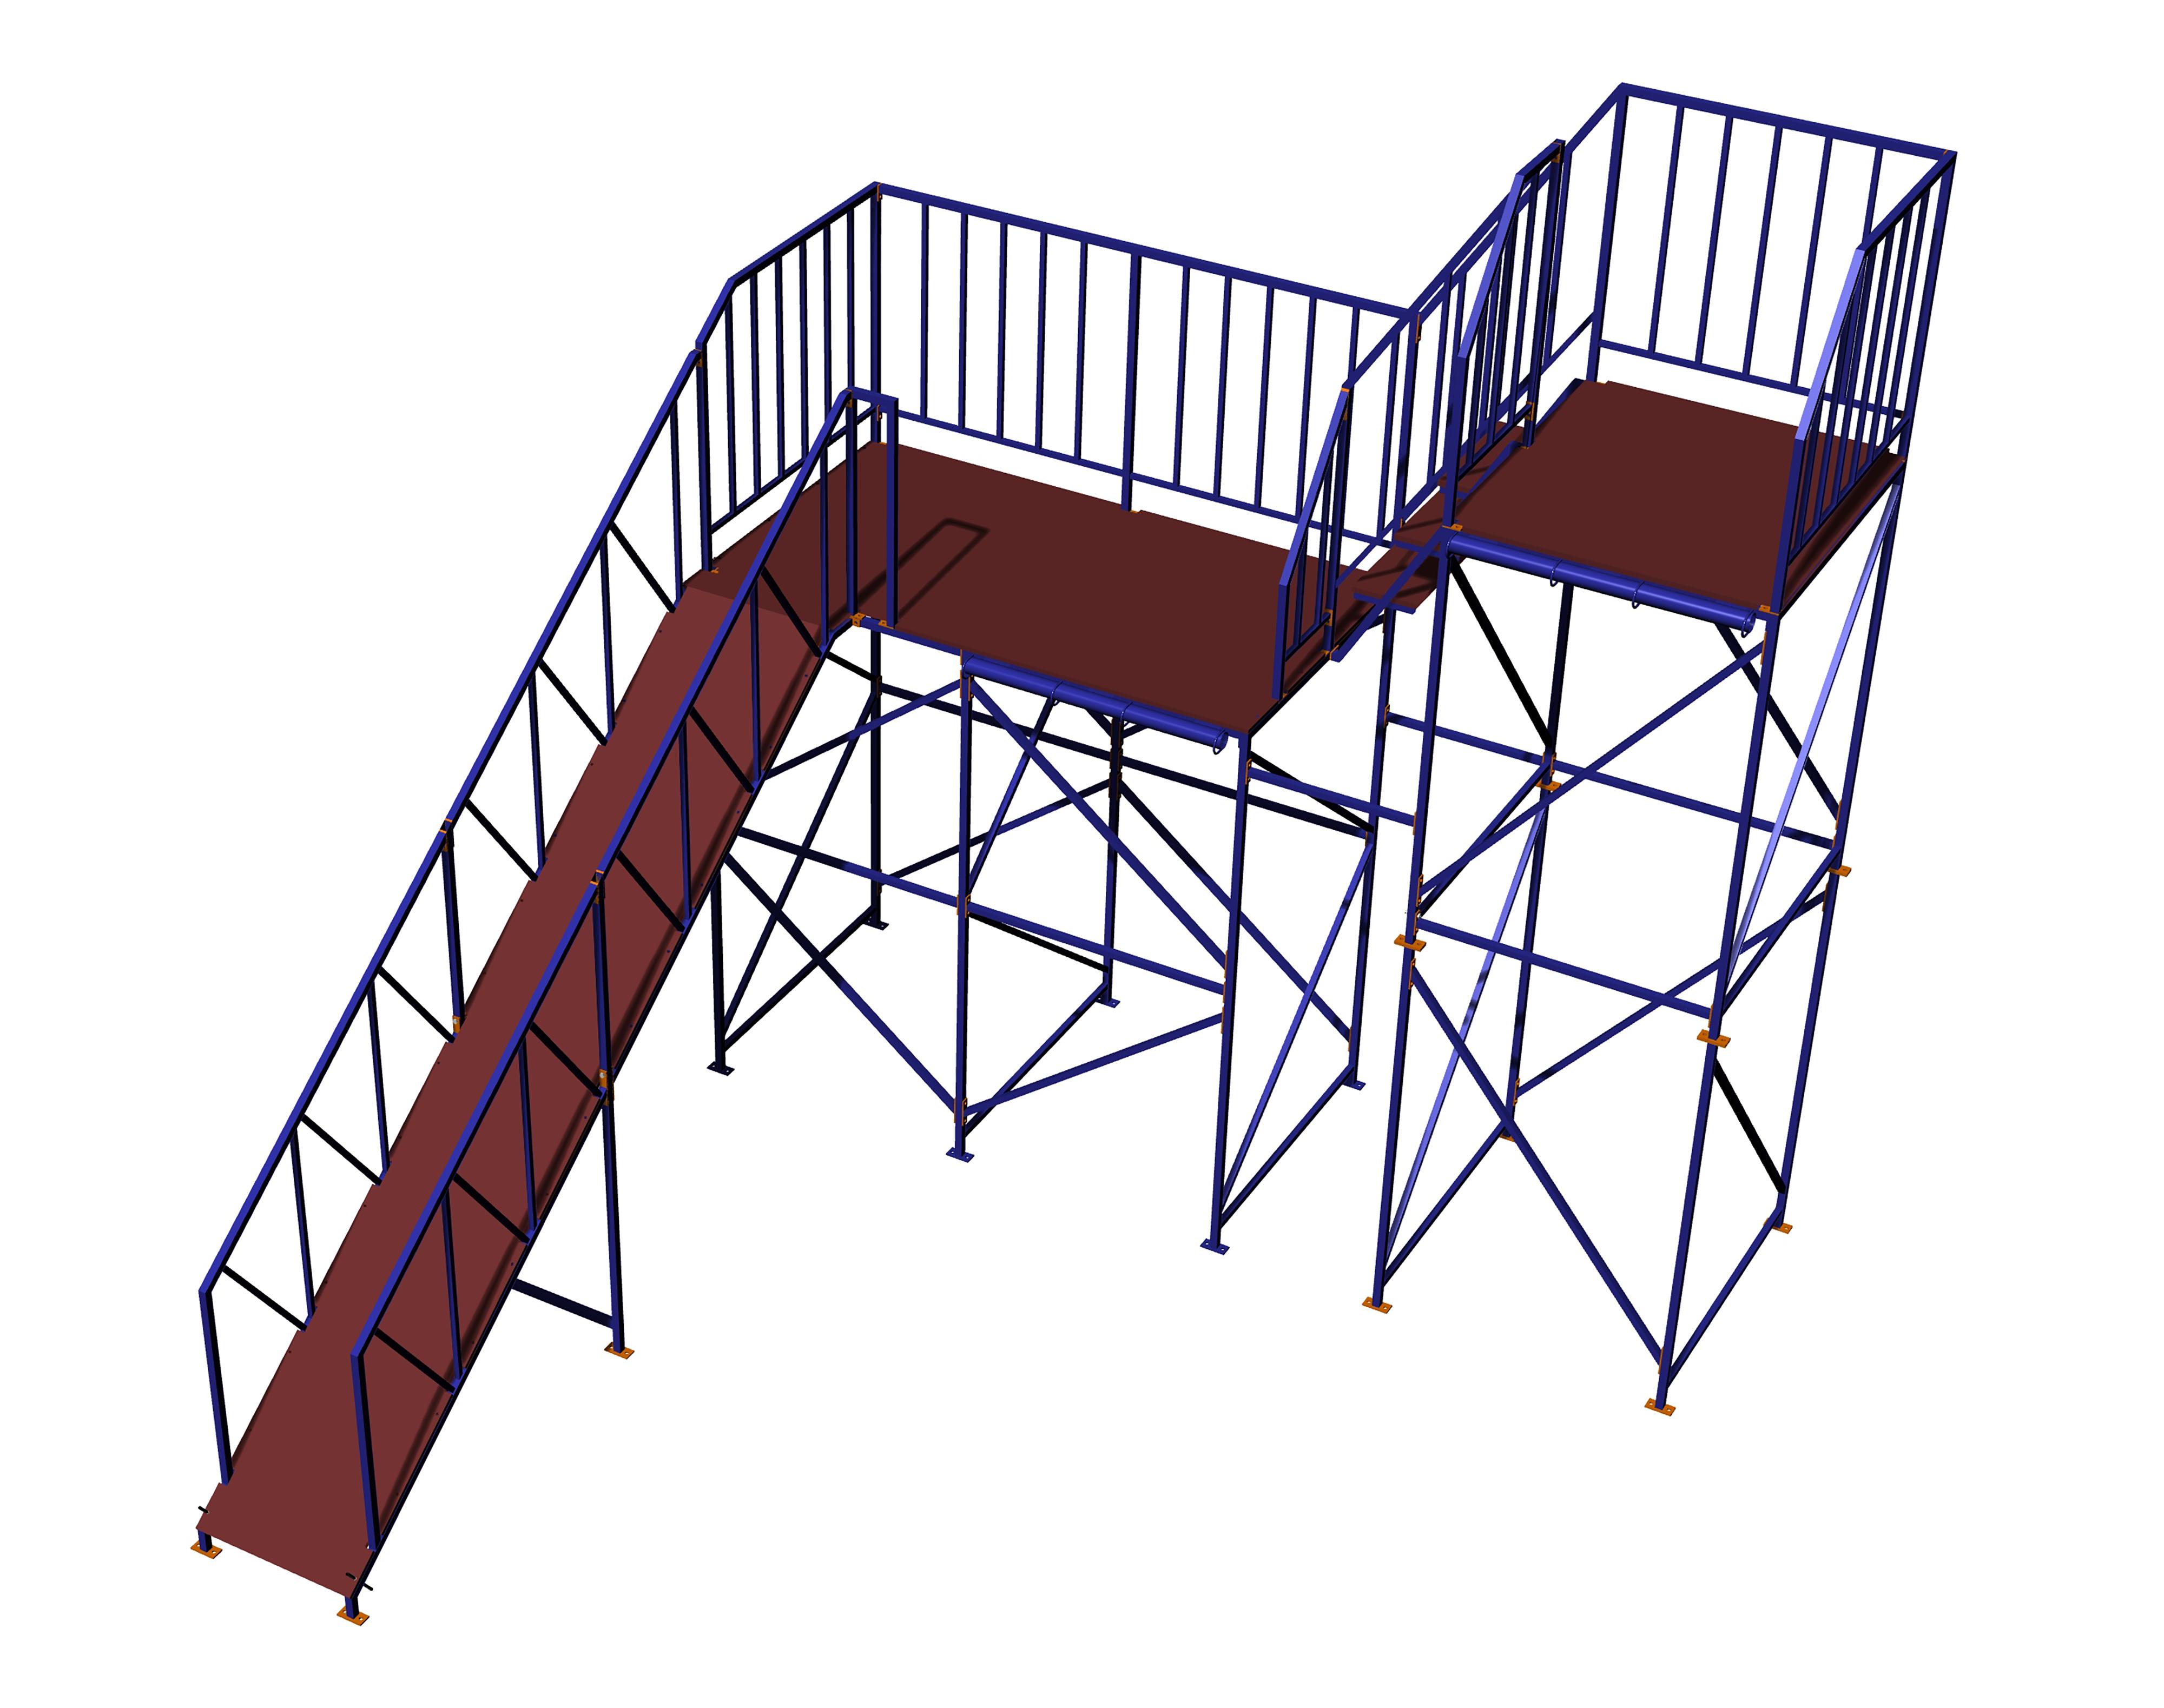 Steel metal tower for waterparks